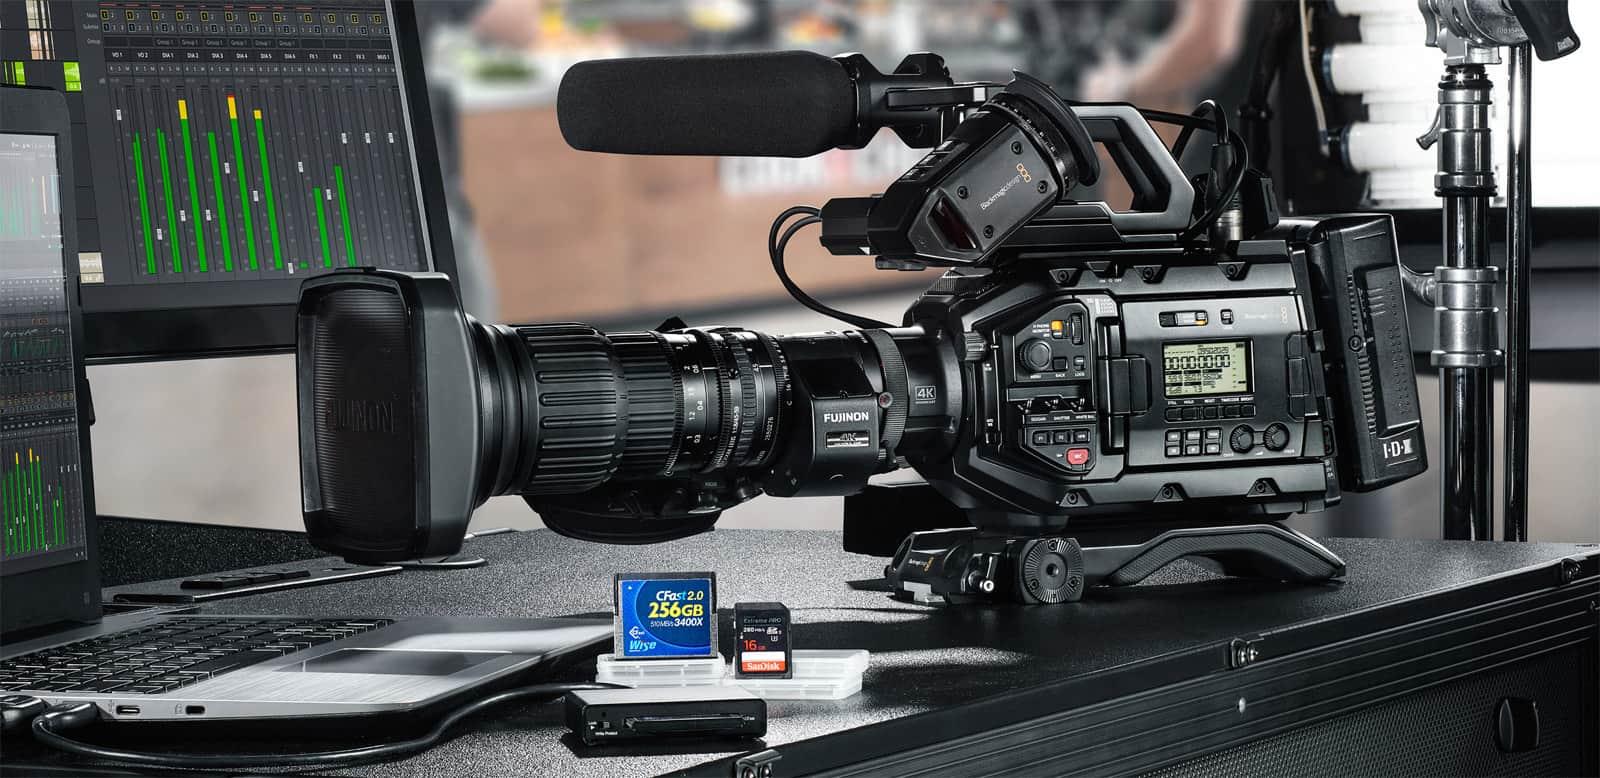 , Broadcast service, MediaMaking